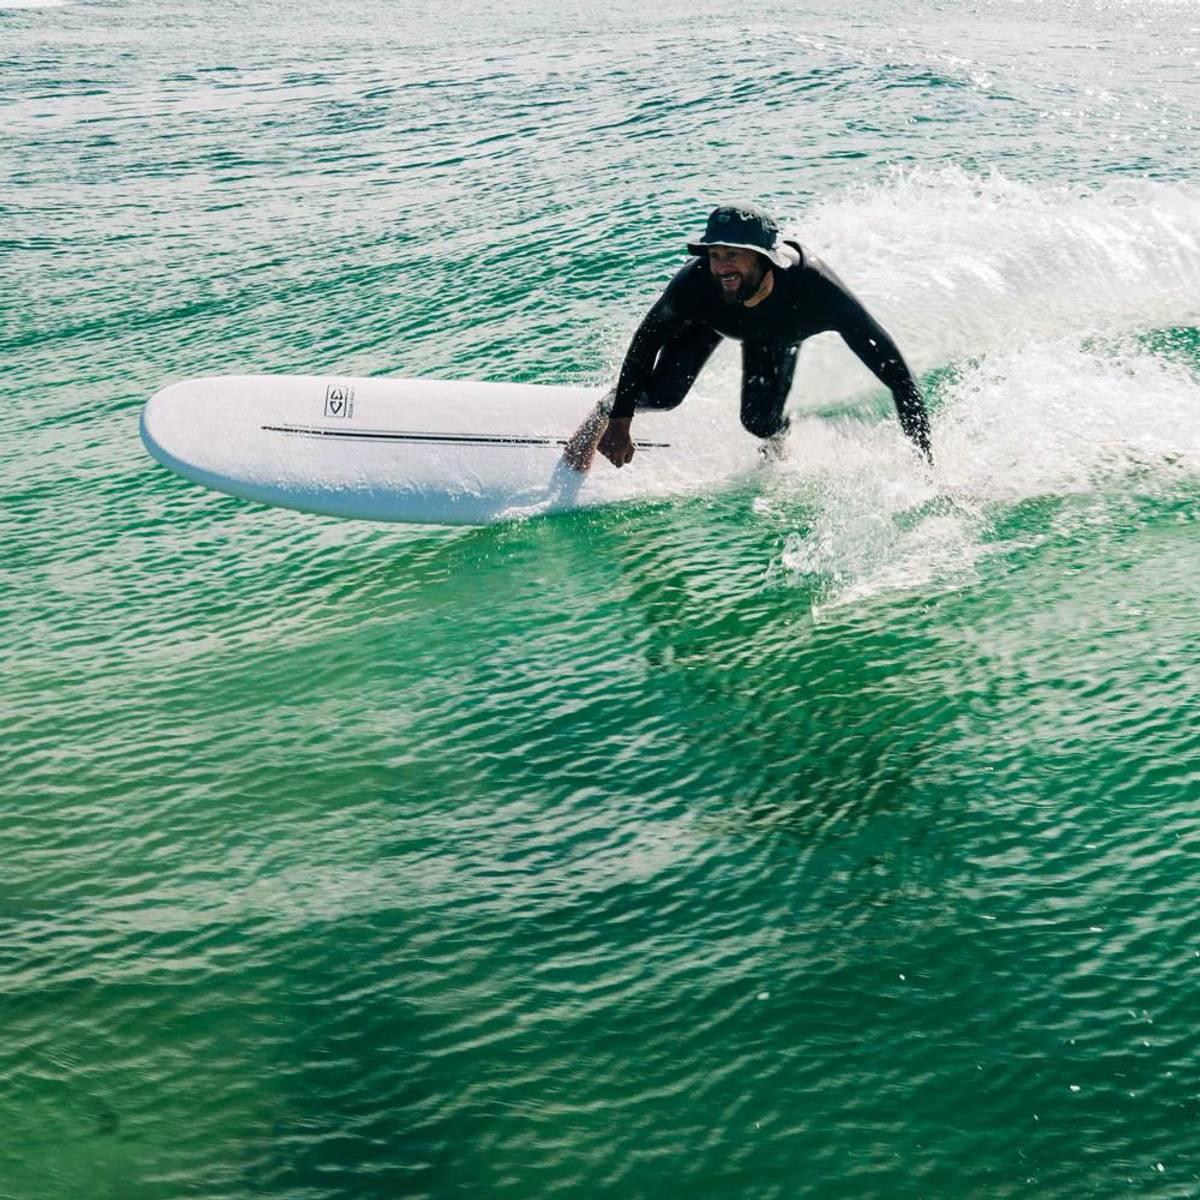 O&E Ezi-Rider 9'0'' - Pastel Blue - Softboard